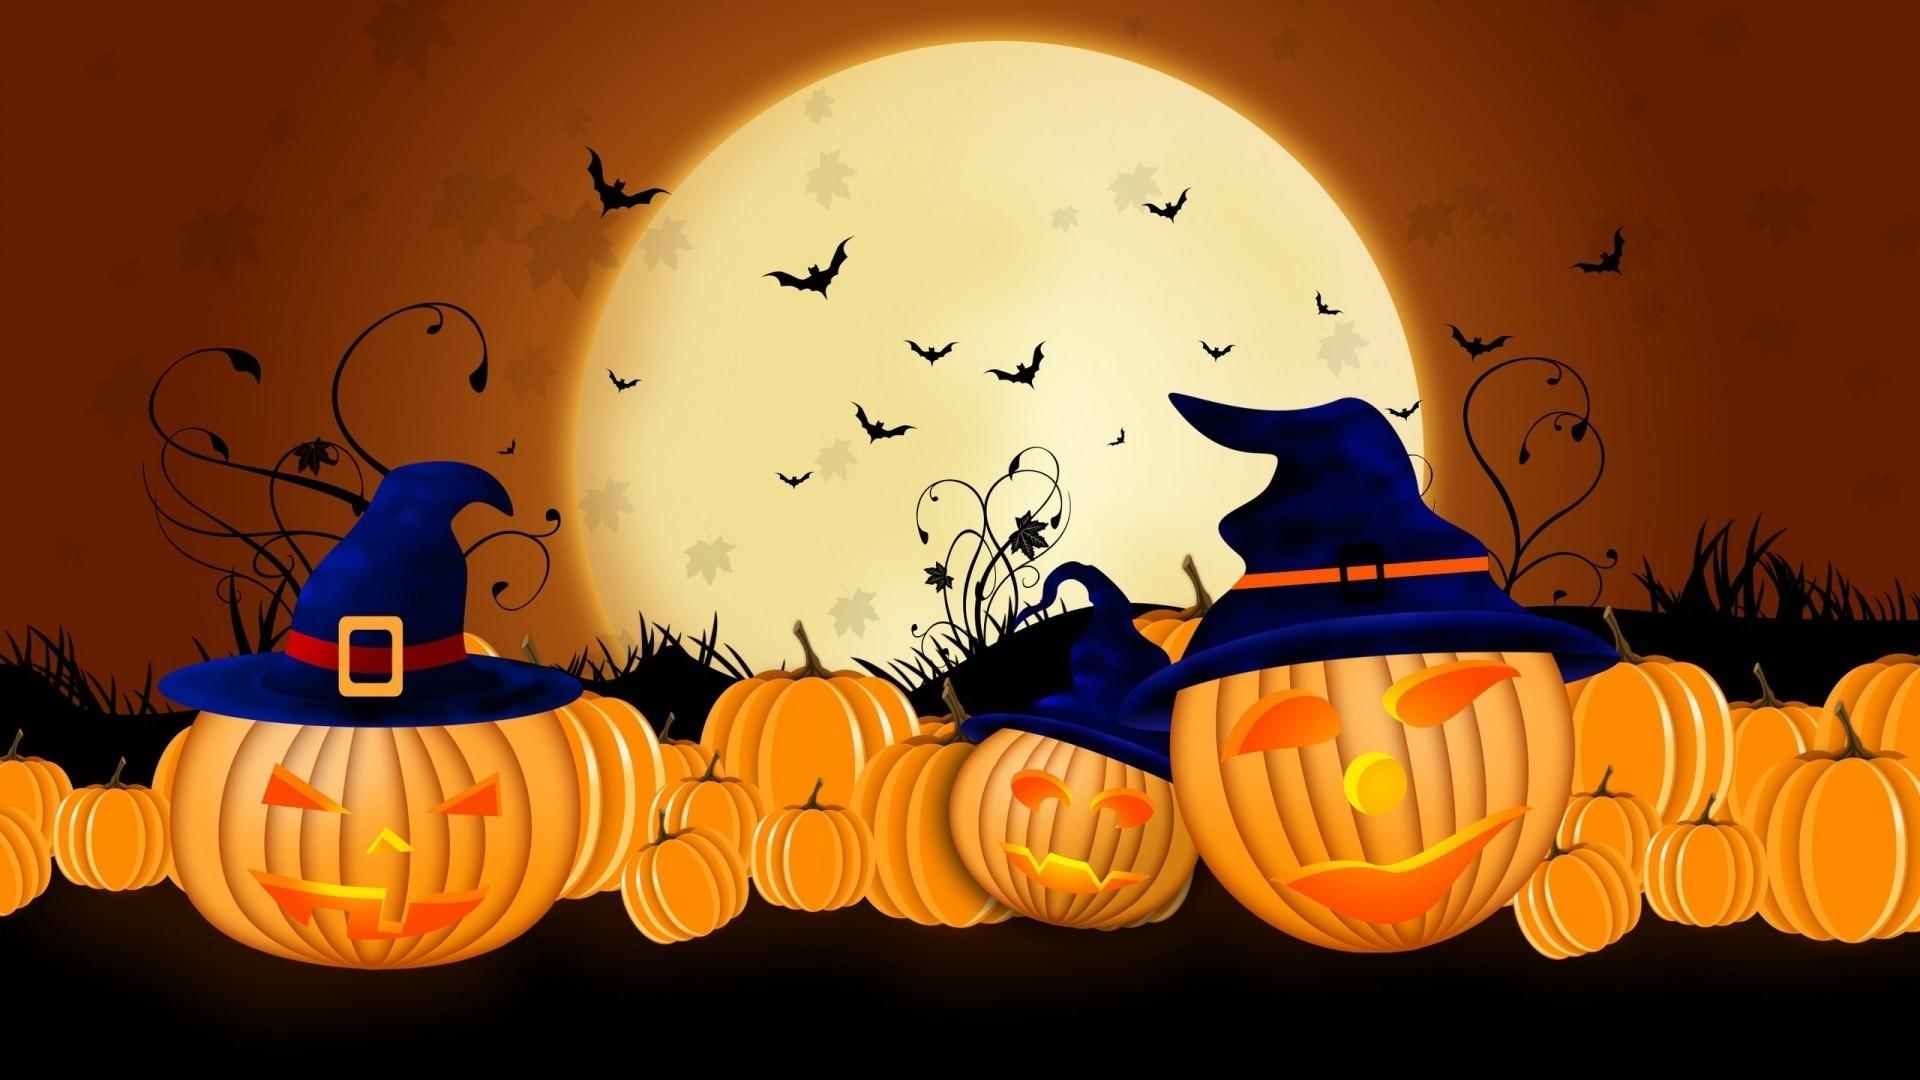 Halloween desktop wallpaper ·① Download free awesome full ...